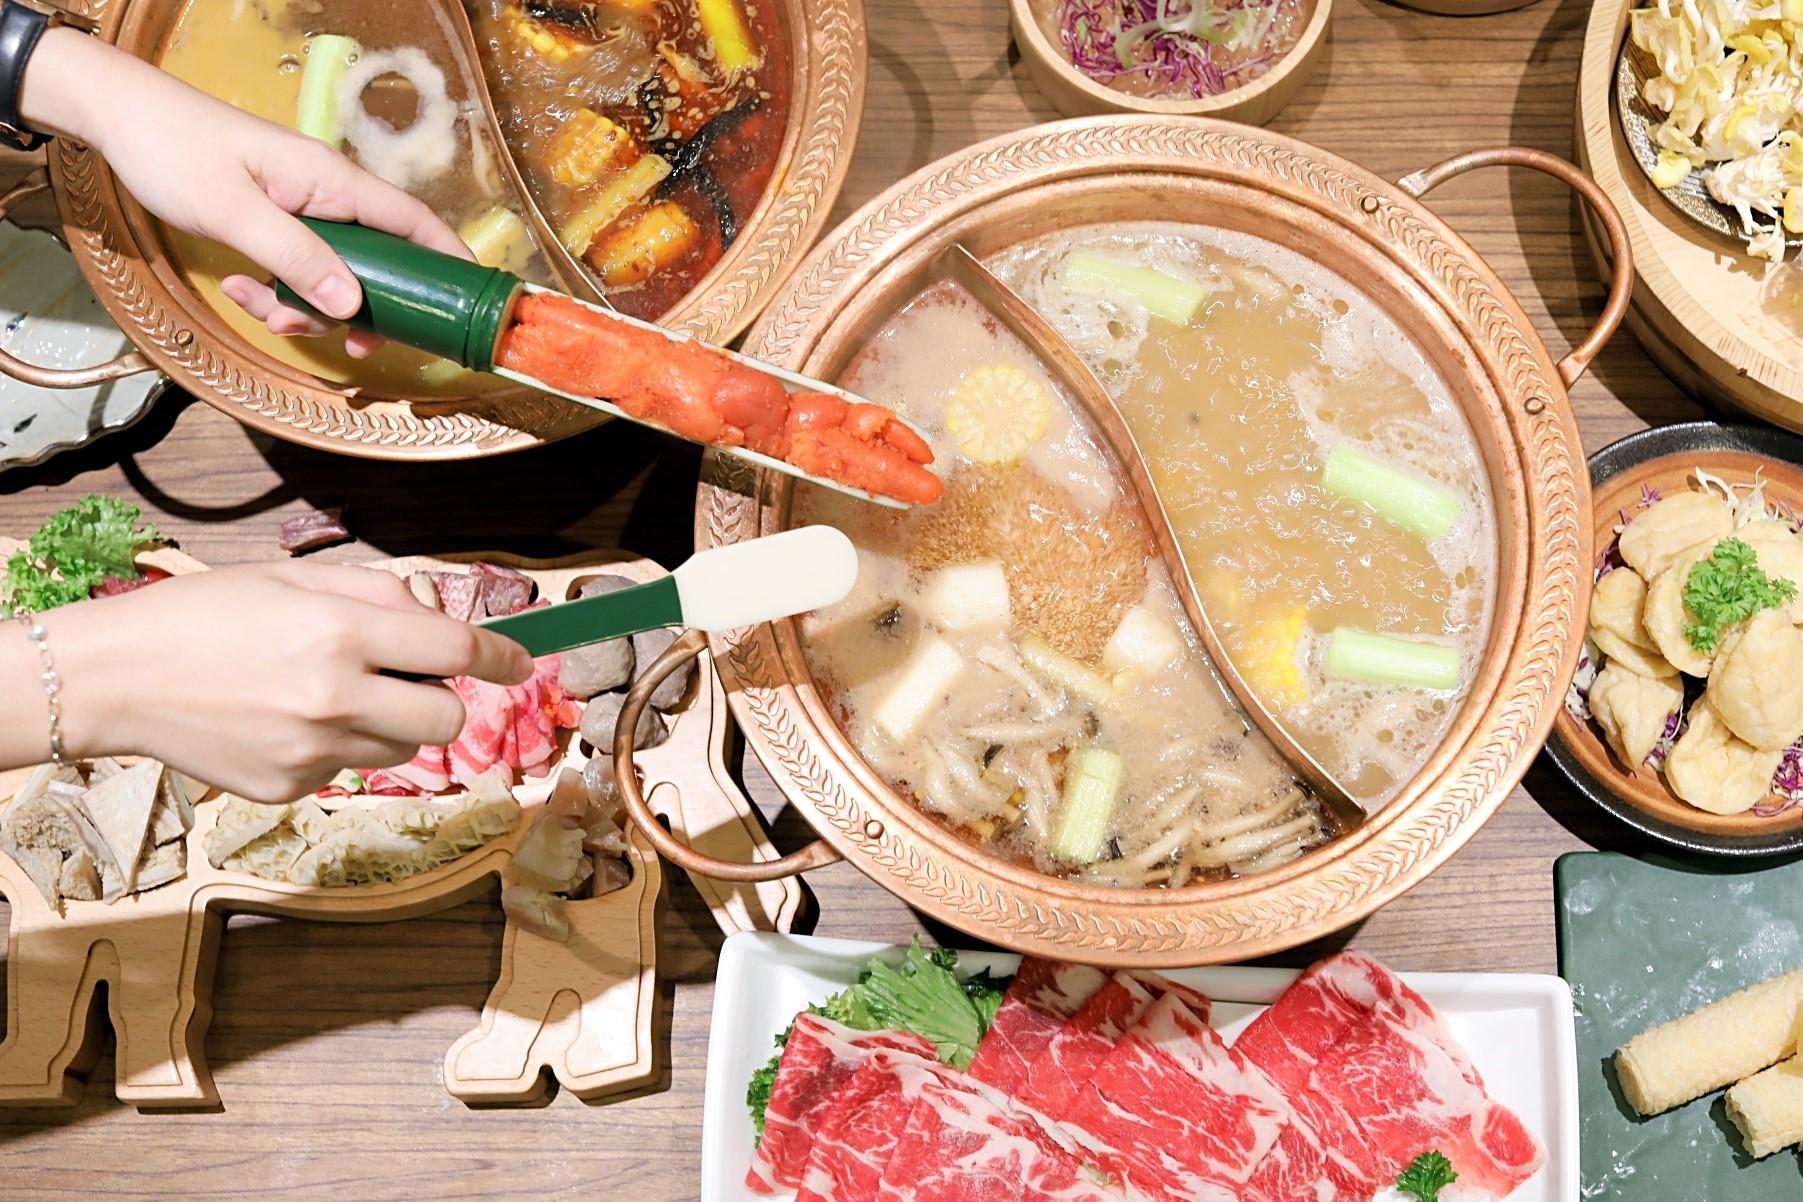 Makino – NEW Japanese Shabu-Shabu Restaurant With Tasty Mentaiko And Tonkotsu Soup Bases, At Paya Lebar Quarter PLQ